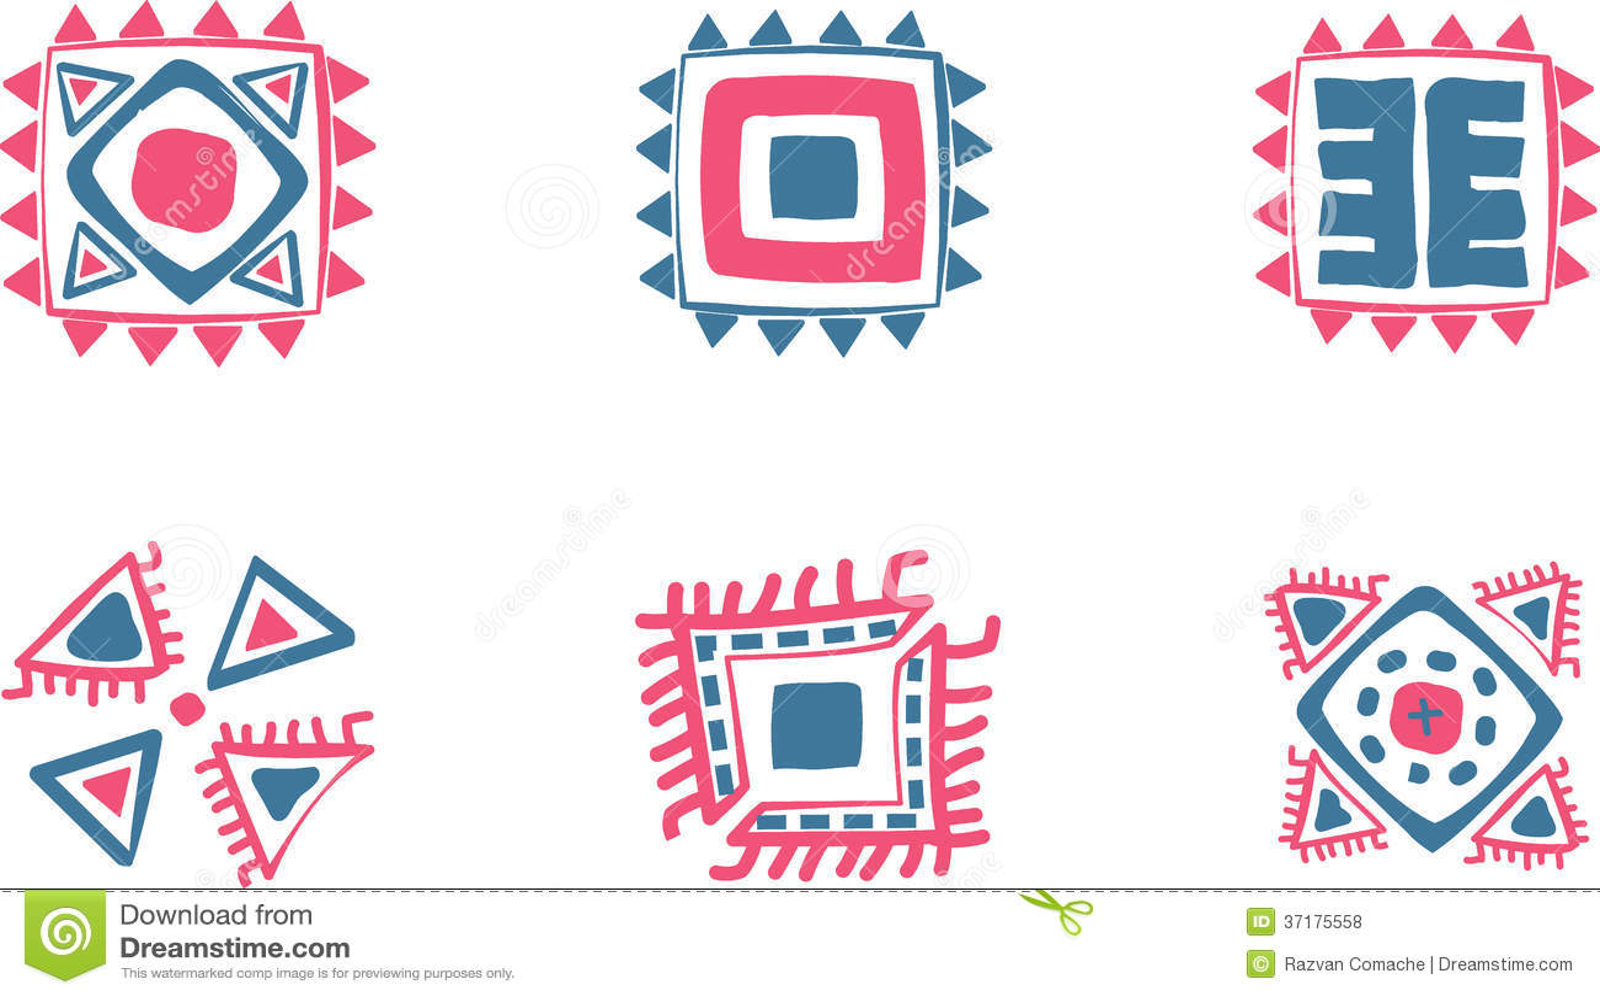 Aztec vector symbols stock vector illustration of accurate 37175558 aztec vector symbols buycottarizona